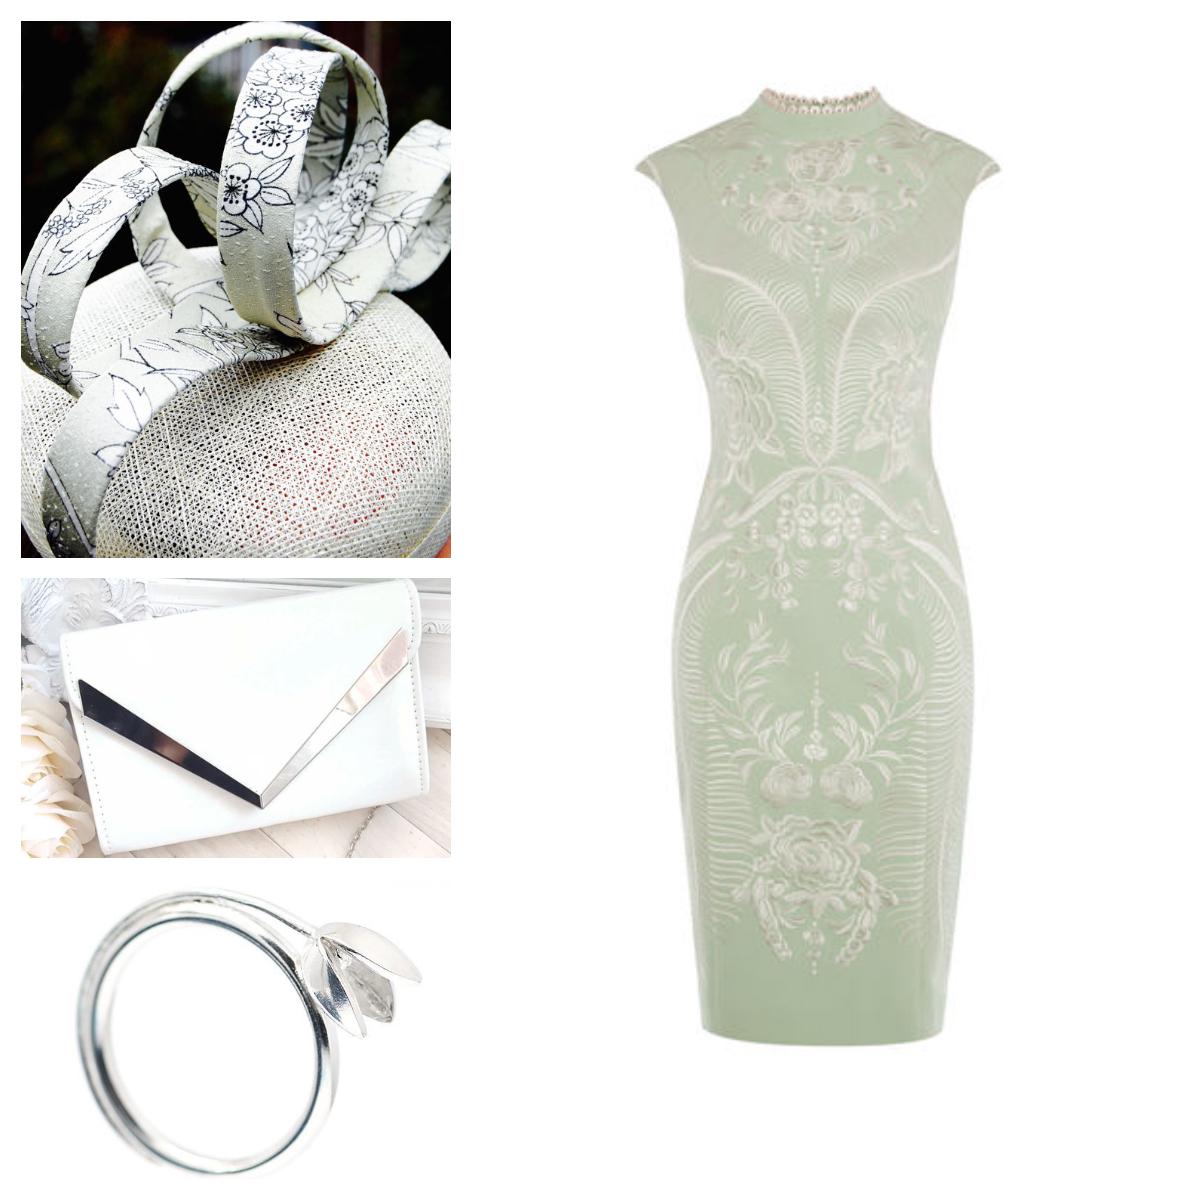 Hat: Aka Tombo Millinery  Dress: Karen Millen  Bag:Milla Patent envelope clutch  Ring: Alex Yule Jewellers